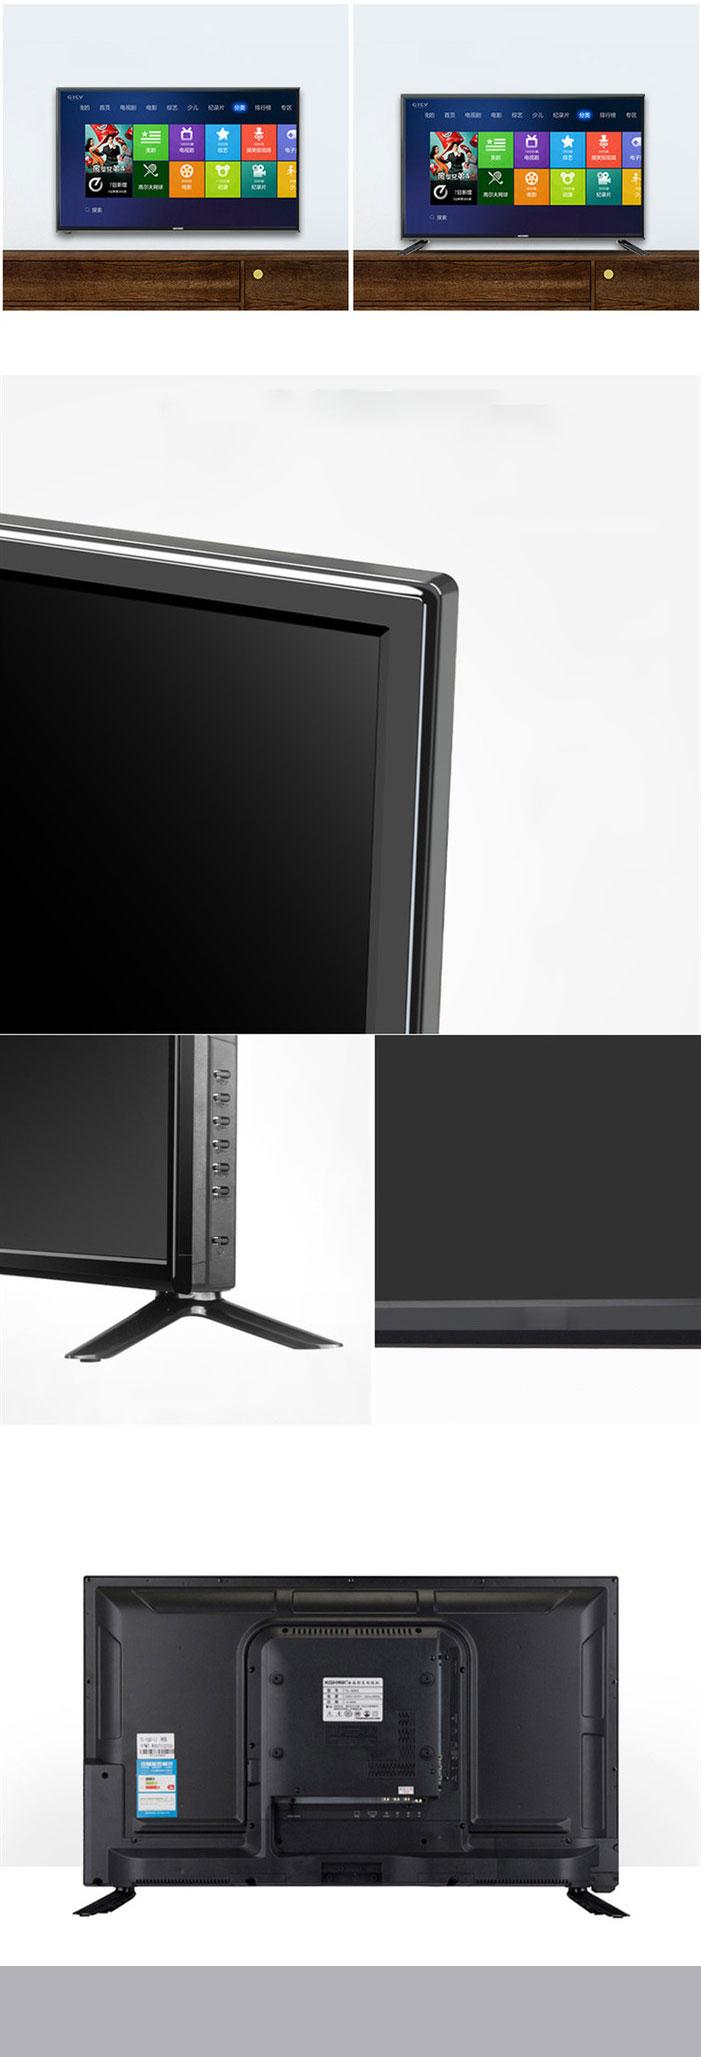 32 inch led tv price in bangladesh